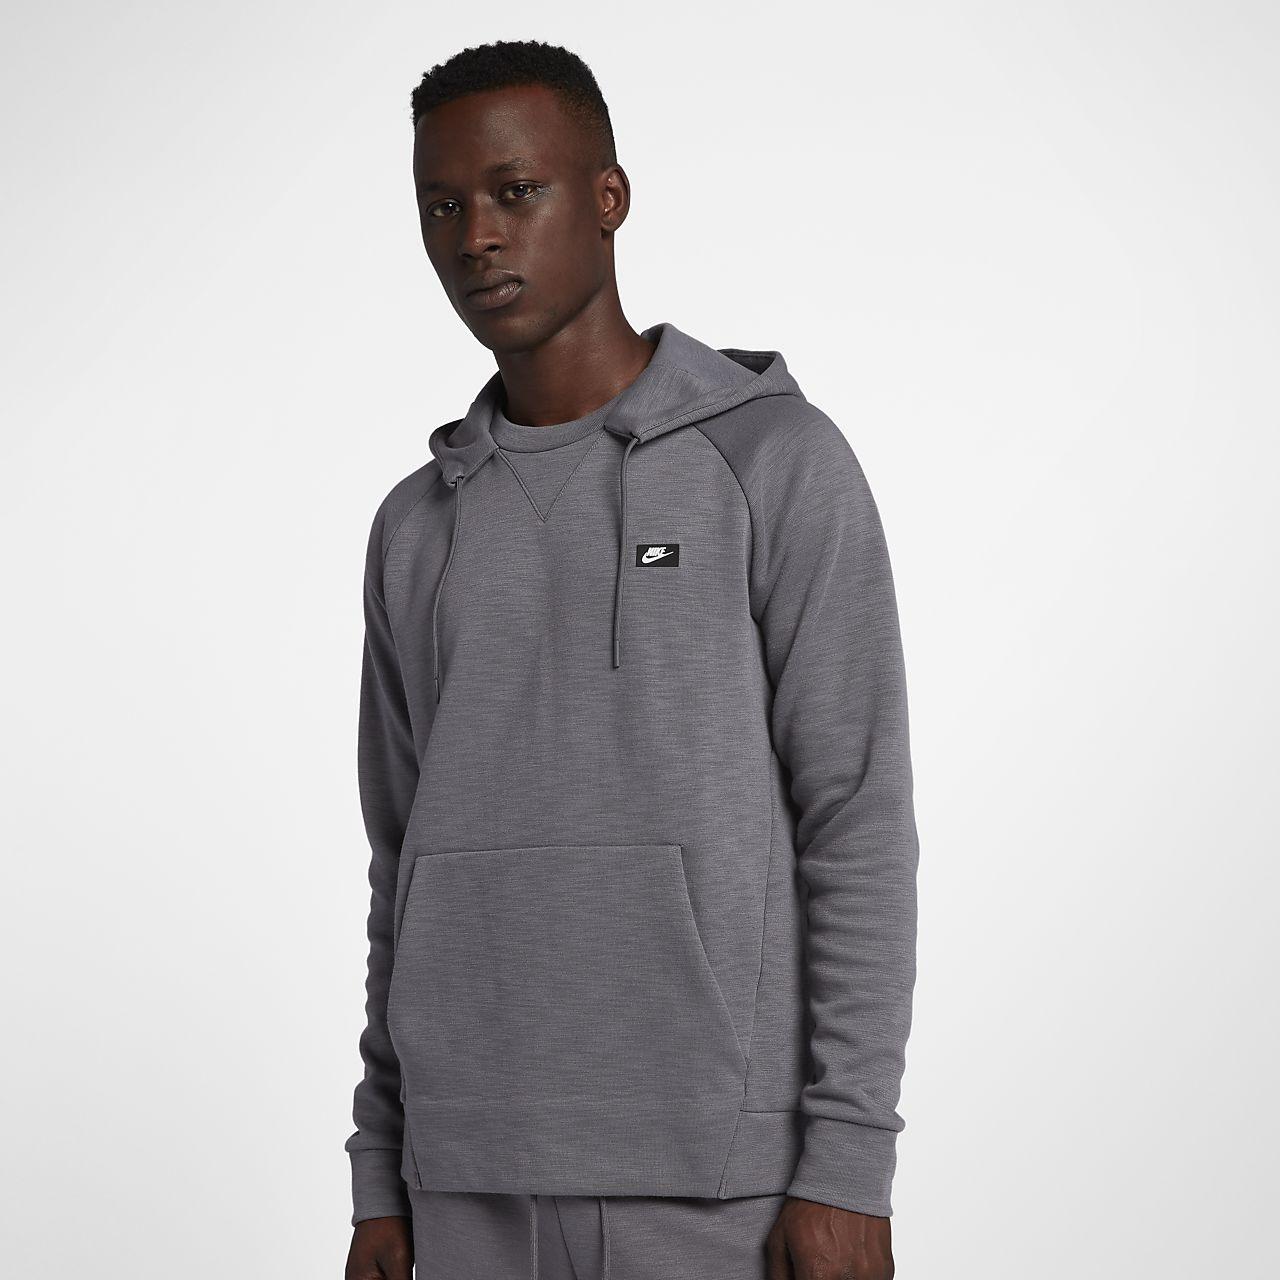 aaced1aacf8e6c Sweat à capuche Nike Sportswear Optic pour Homme. Nike.com BE